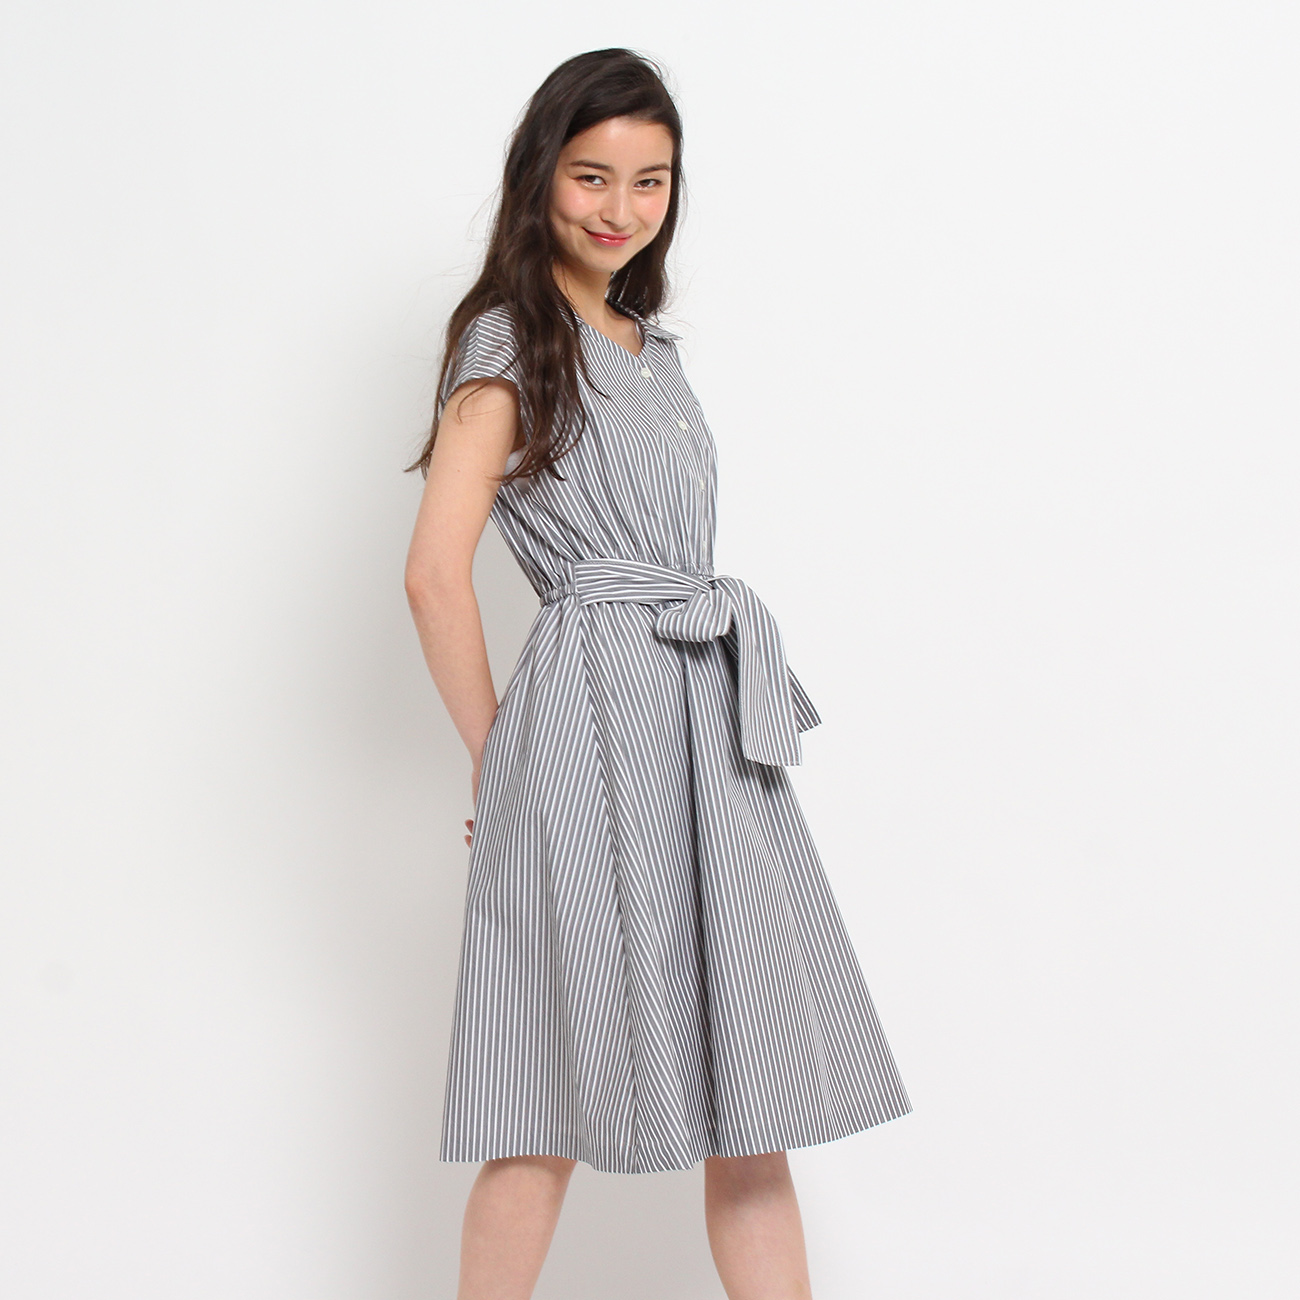 【Couture brooch (クチュールブローチ)】2WAYリボンワンピースレディース ワンピース|ワンピース ブラック